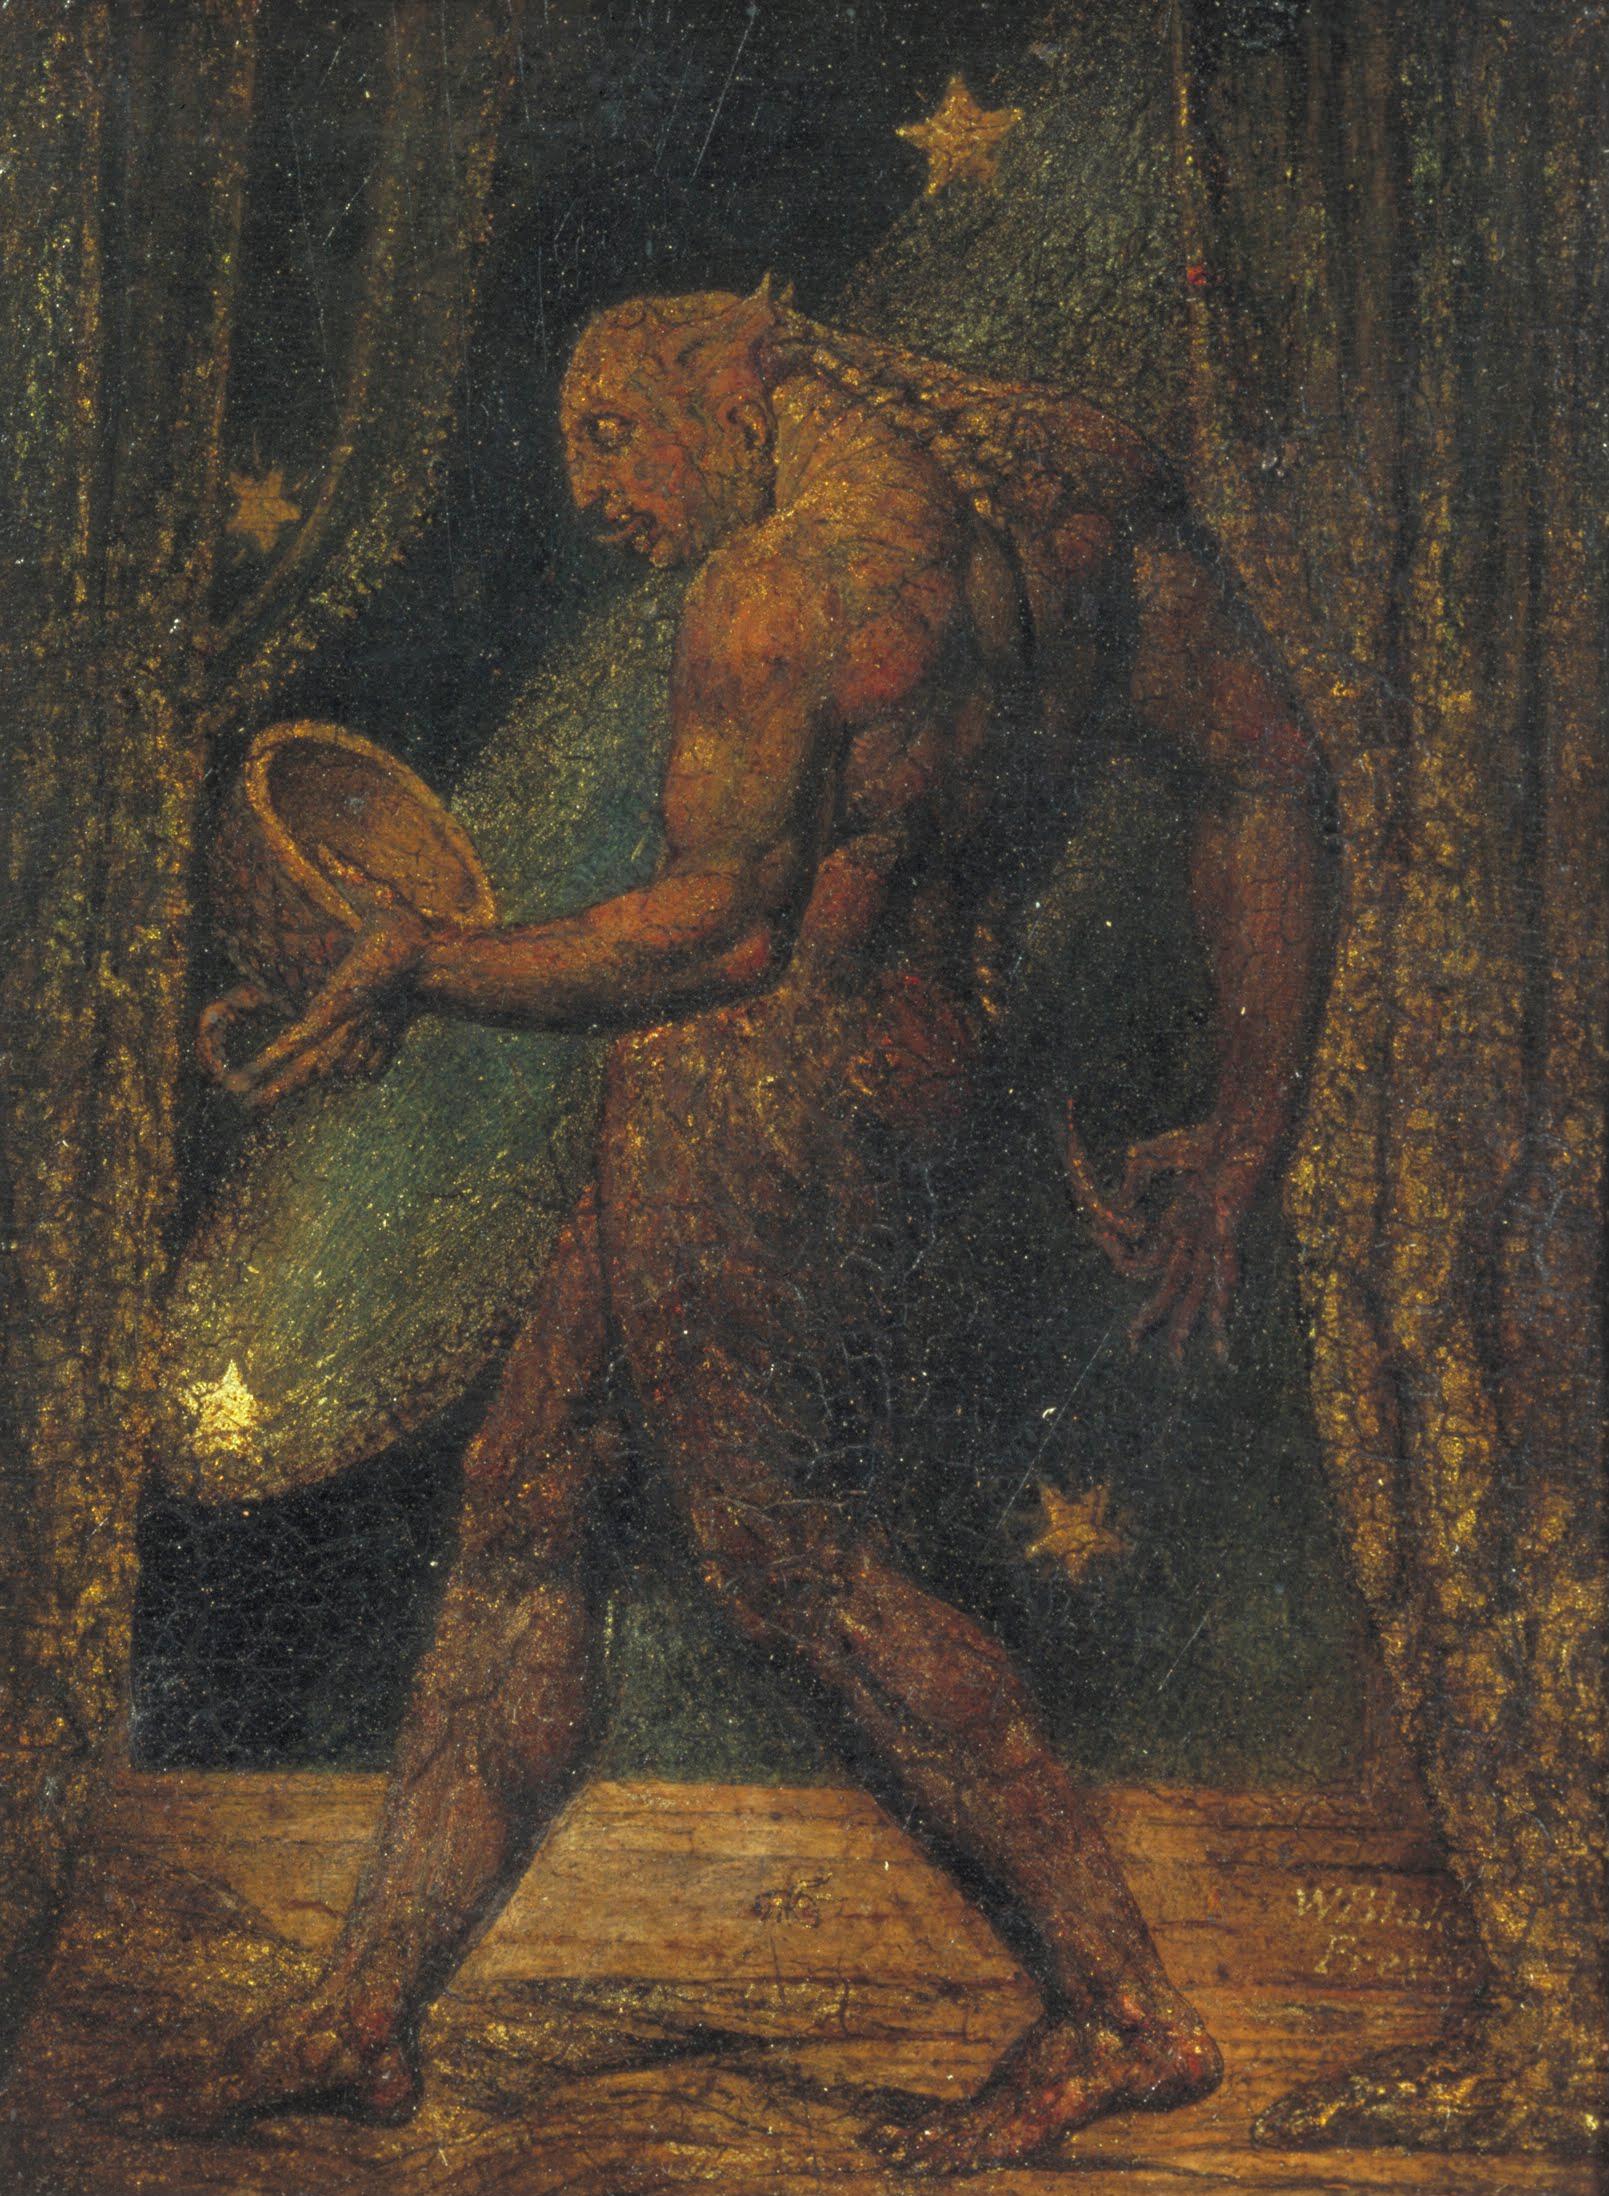 4 Blake The Ghost of a Flea ± 1820